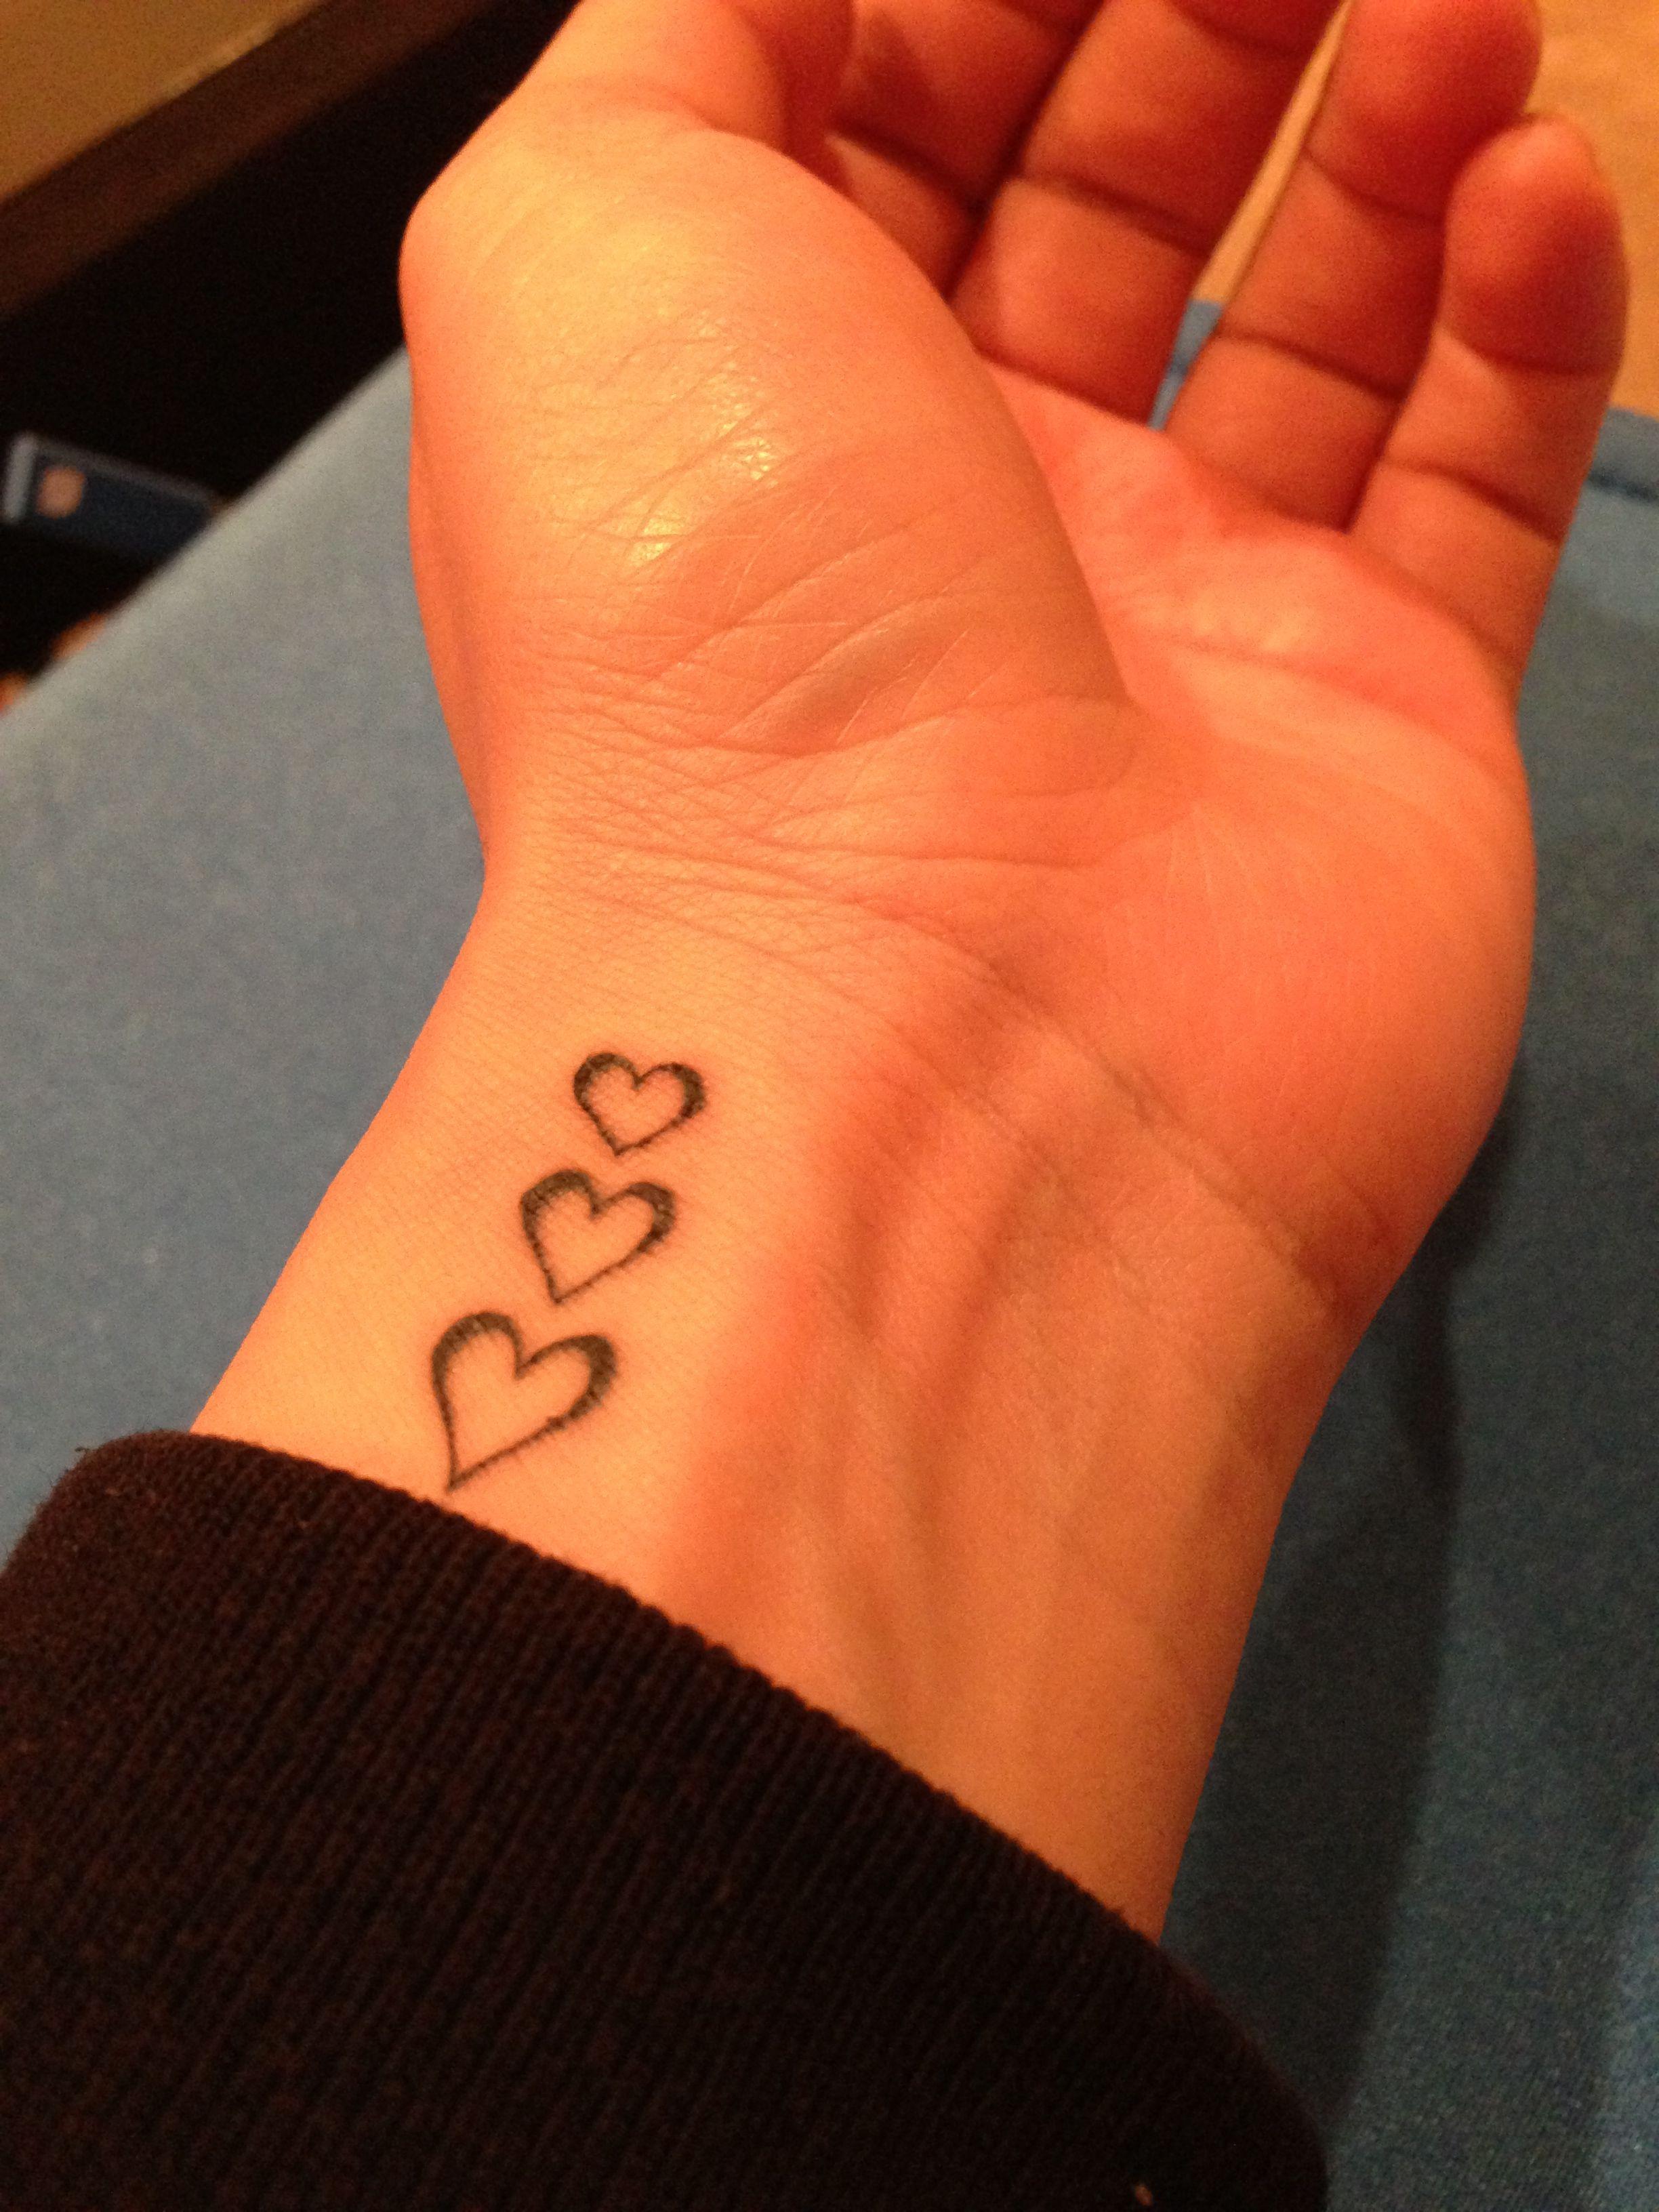 3 Hearts Tattoo : hearts, tattoo, Hearts, Tattoo, Wrist., Small, Wrist, Tattoos,, Heart, Wrist,, Tattoos